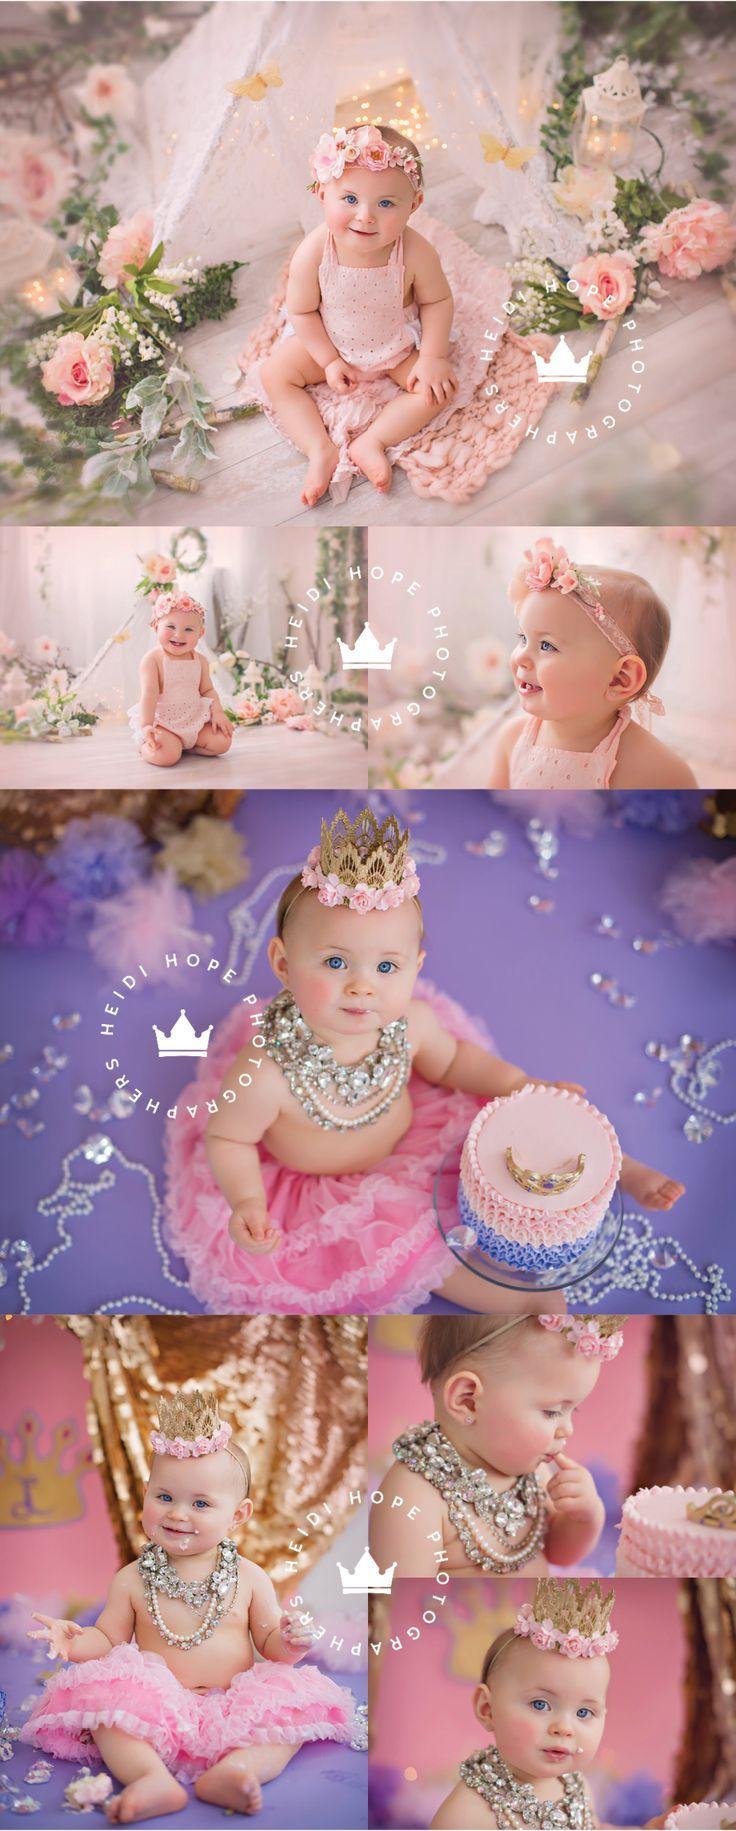 Princess L S Royal First Birthday Cake Smash Heidi Hope